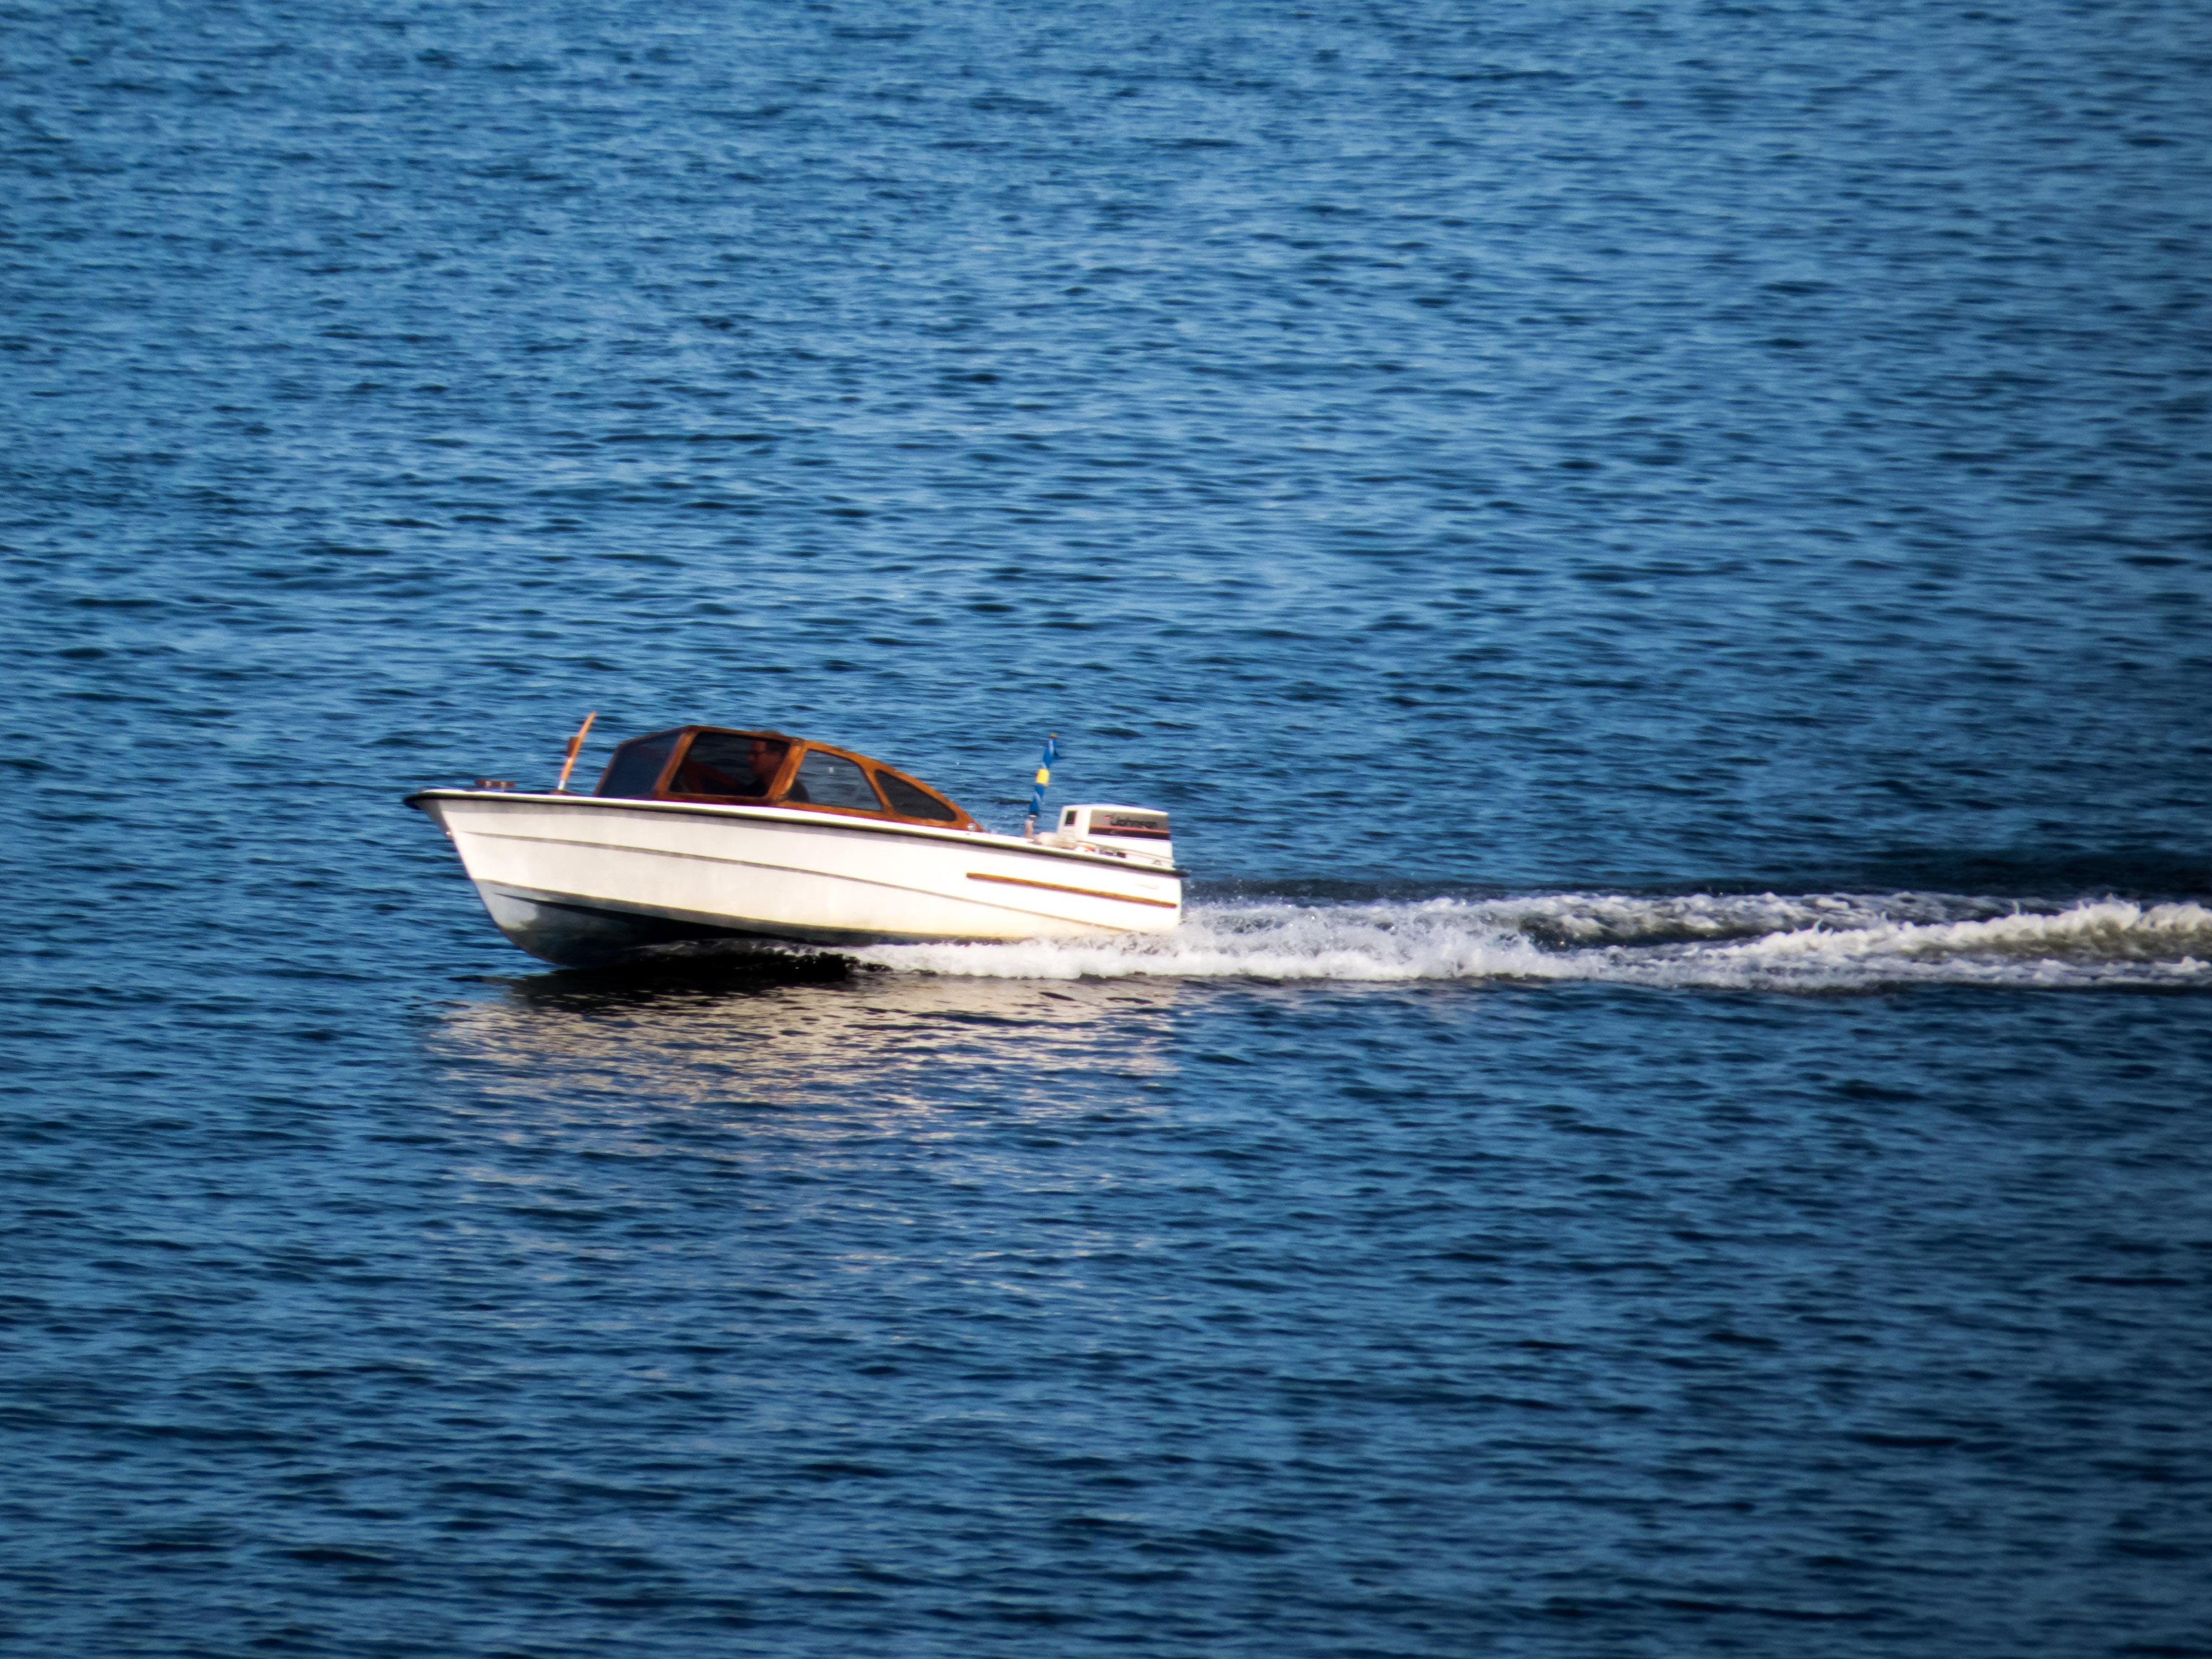 Fast boat photo